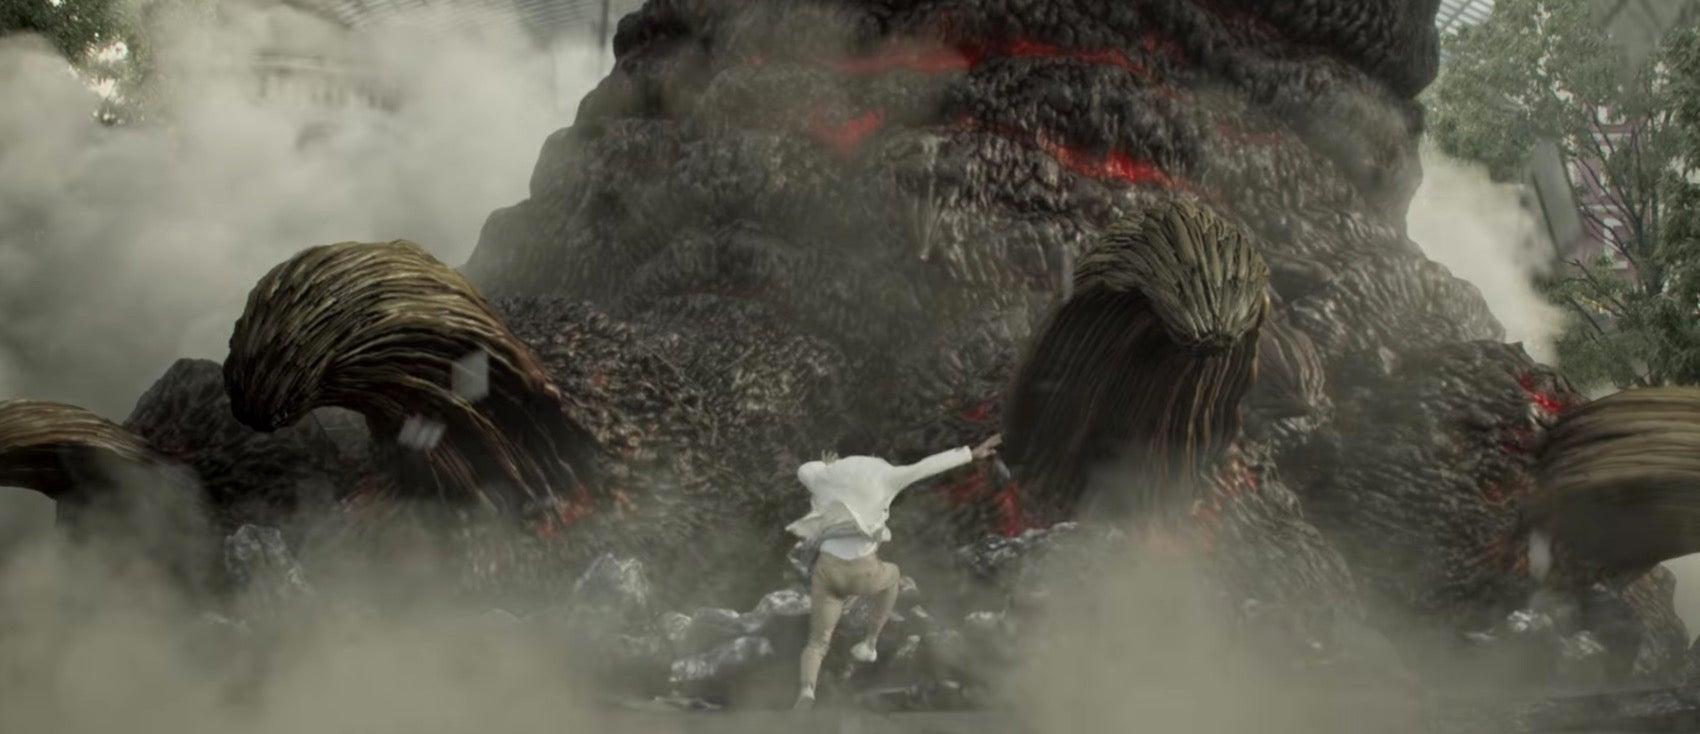 Watch A Crazy Trailer For Japan's 4D Godzilla Theme Park